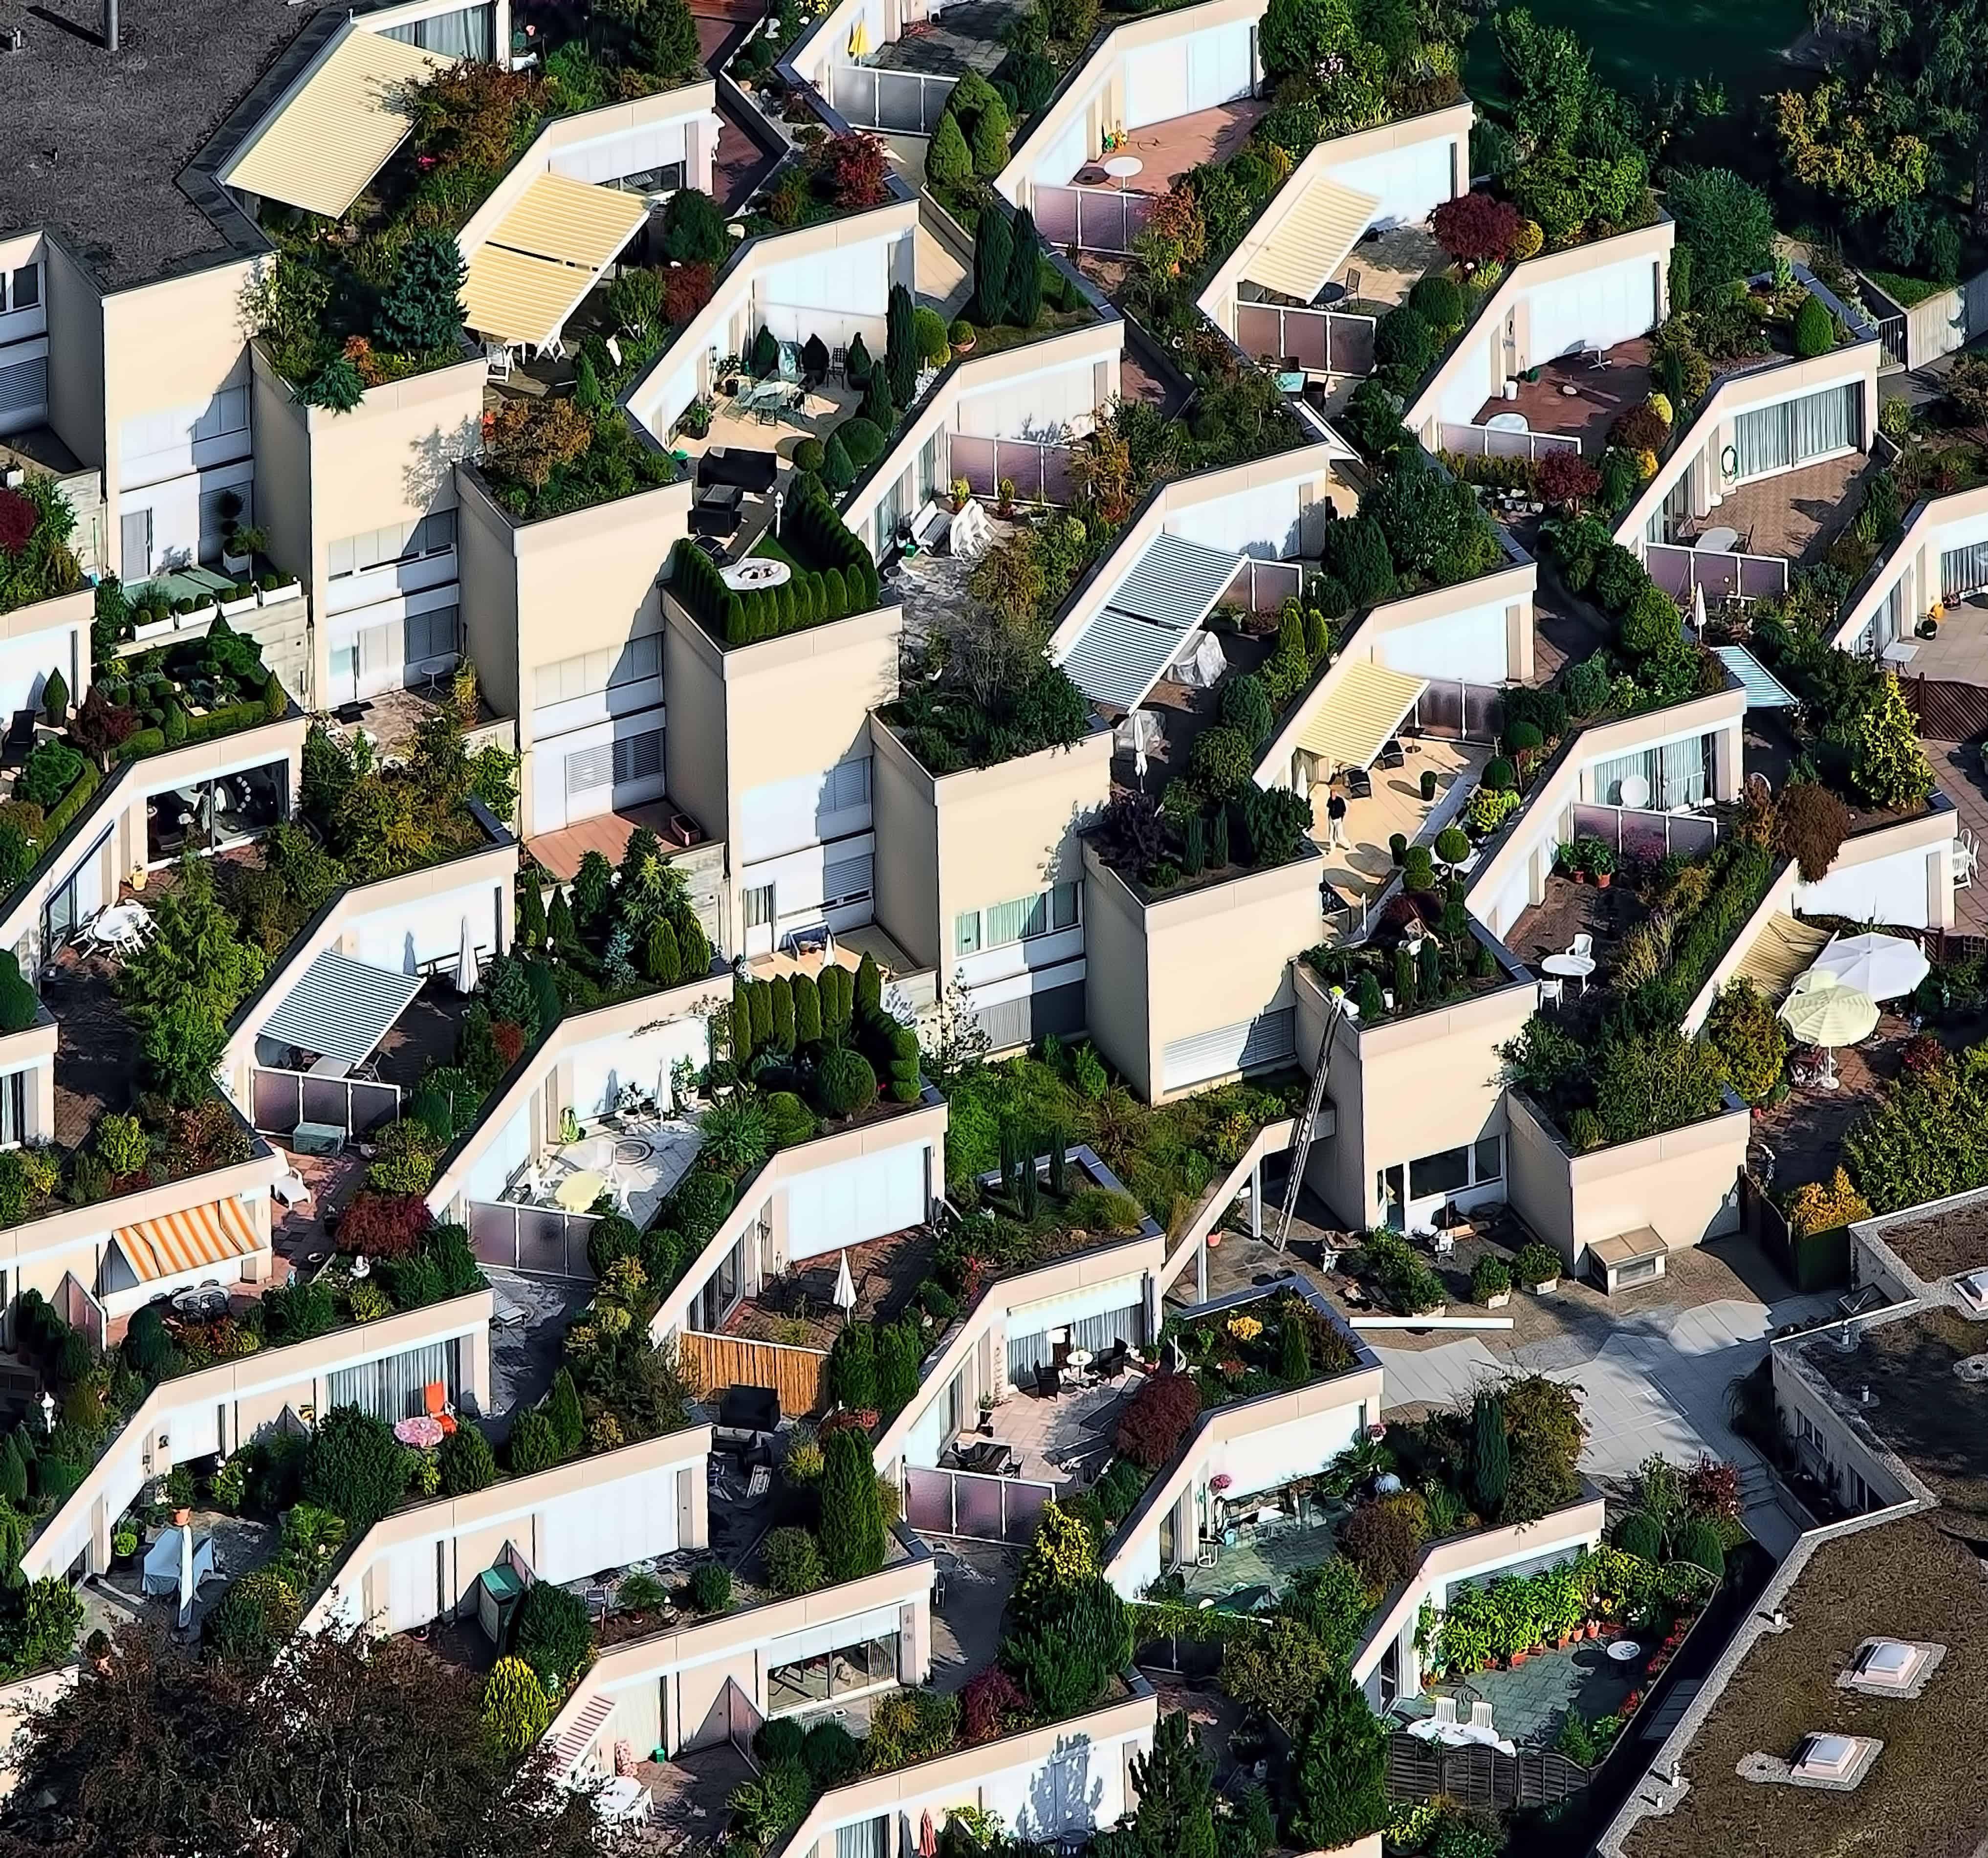 immobilienmakler mehr verkäufe digitale verkaufsstrategien